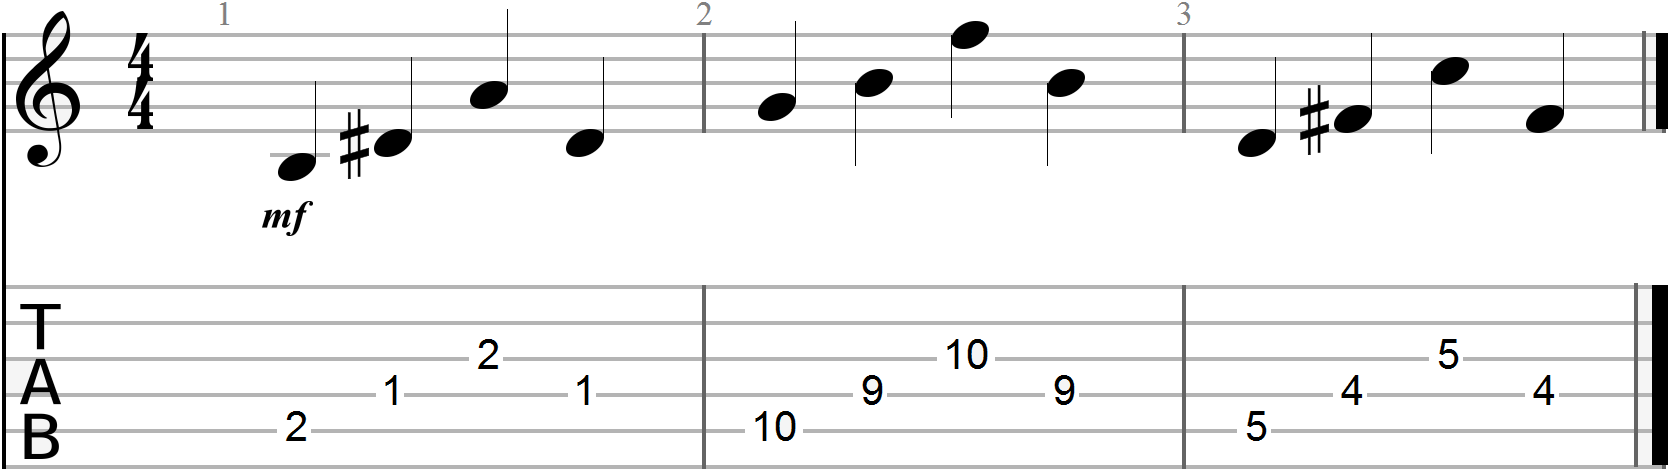 B7 Chord Guitar Exercise